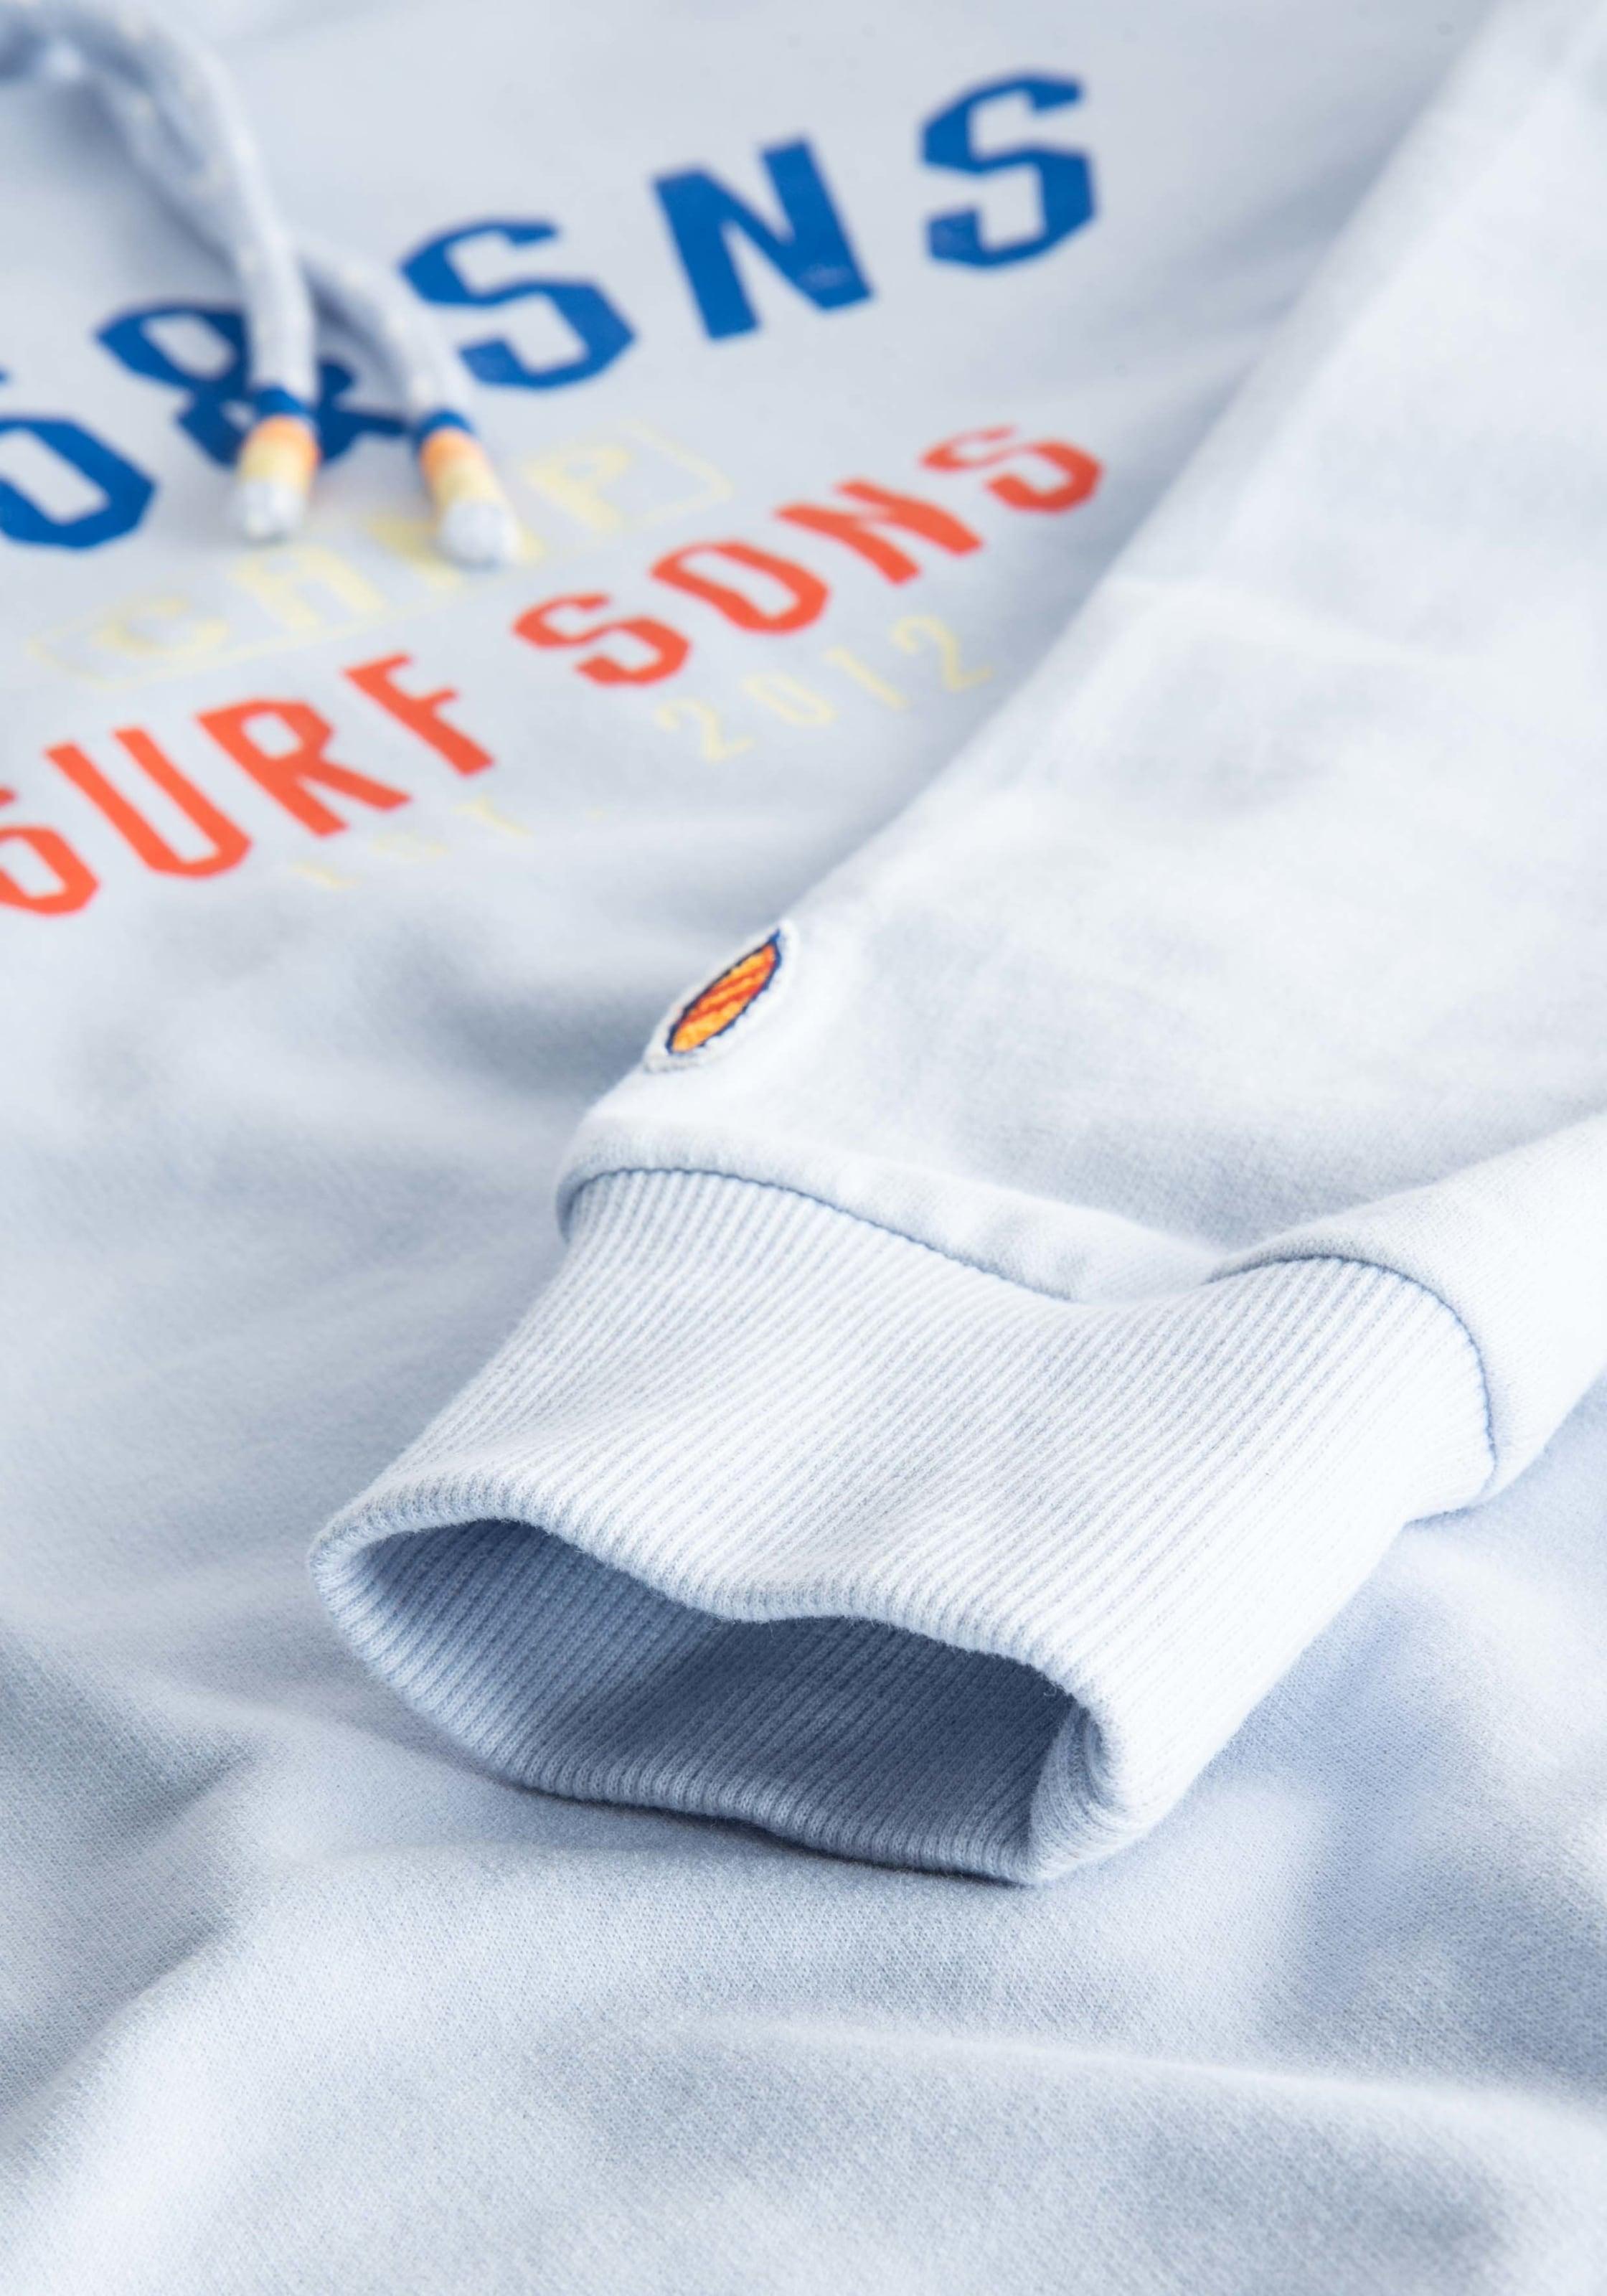 Sweatshirt In Sons 'bruno' Coloursamp; BlauAzur Dunkelorange 8nwkN0POXZ